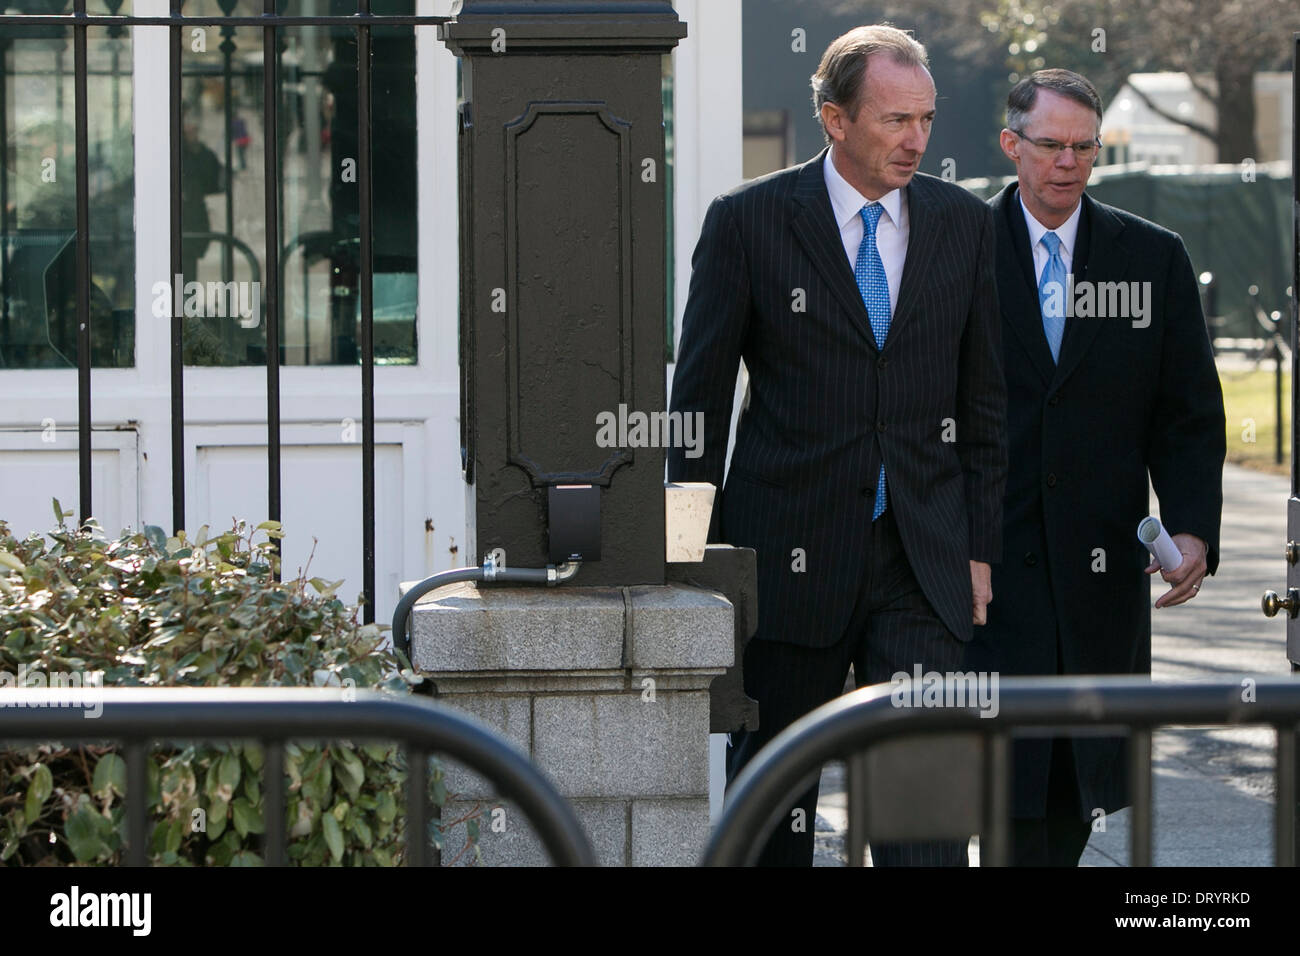 James Gorman, CEO, Morgan Stanley, left, and Richard Davis, Chairman, US Bancorp, right. - Stock Image